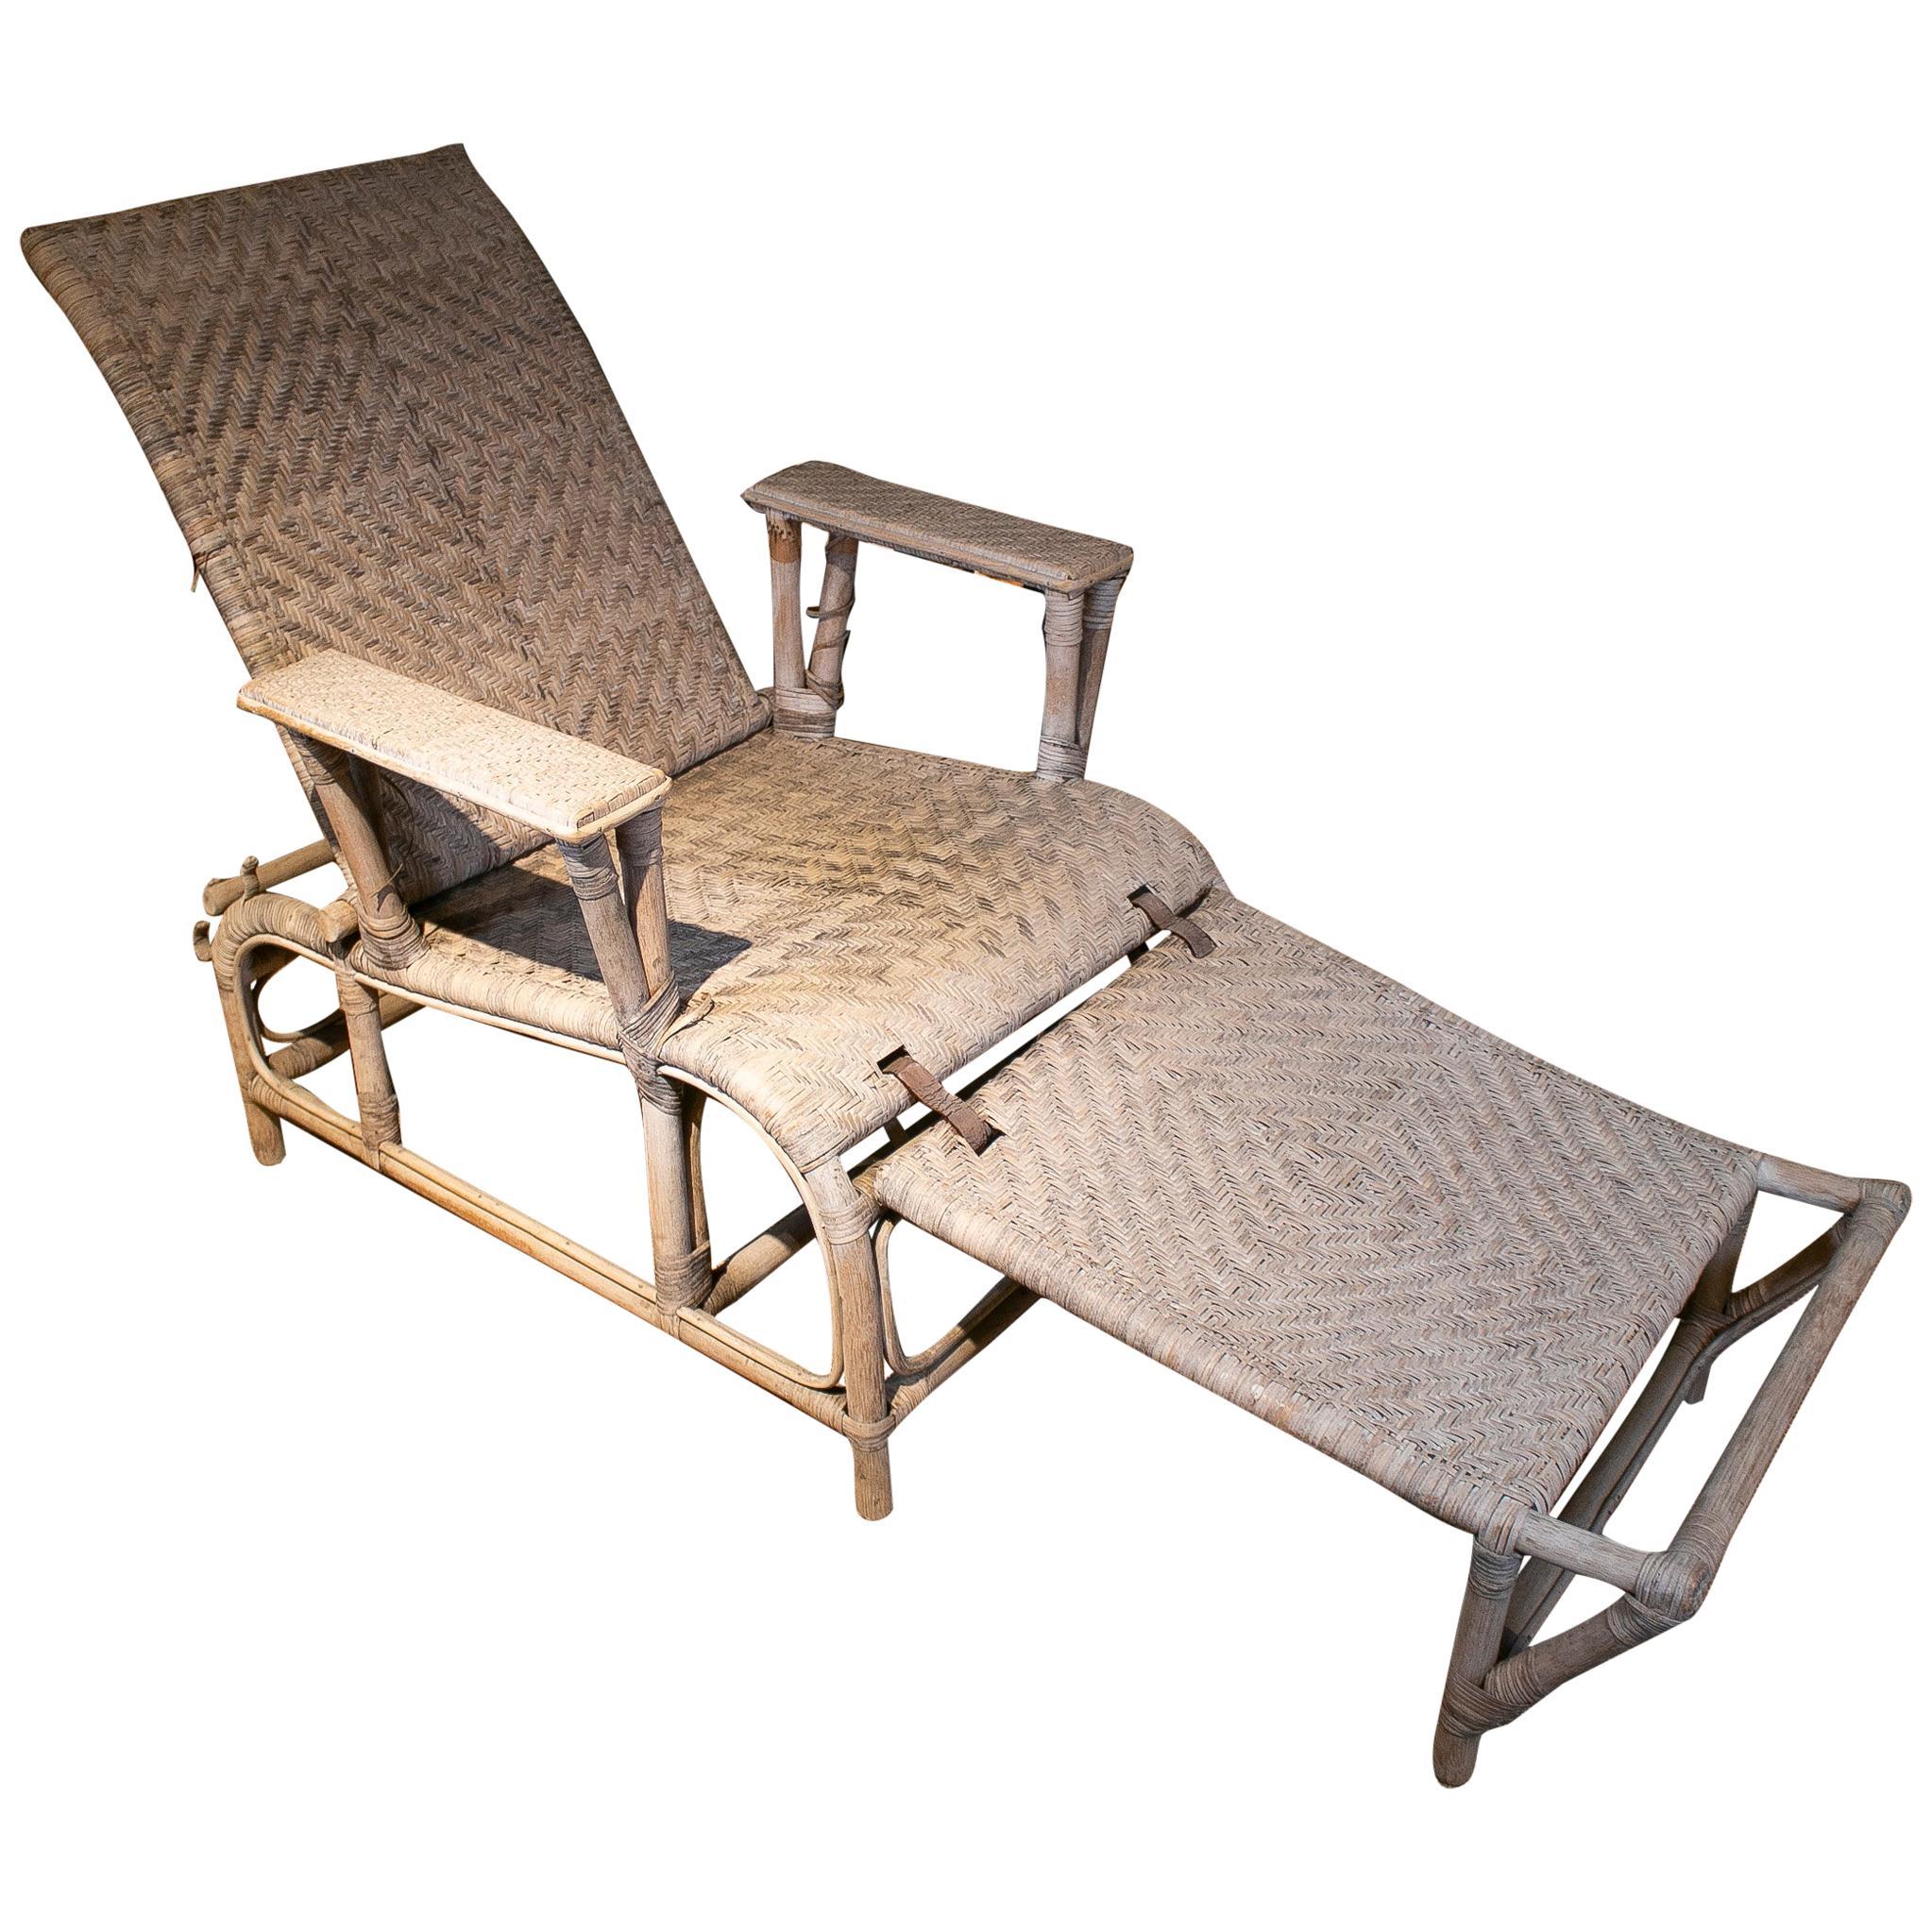 1980s Spanish White Bamboo & Wicker Folding Sunbathing Lounge Chair